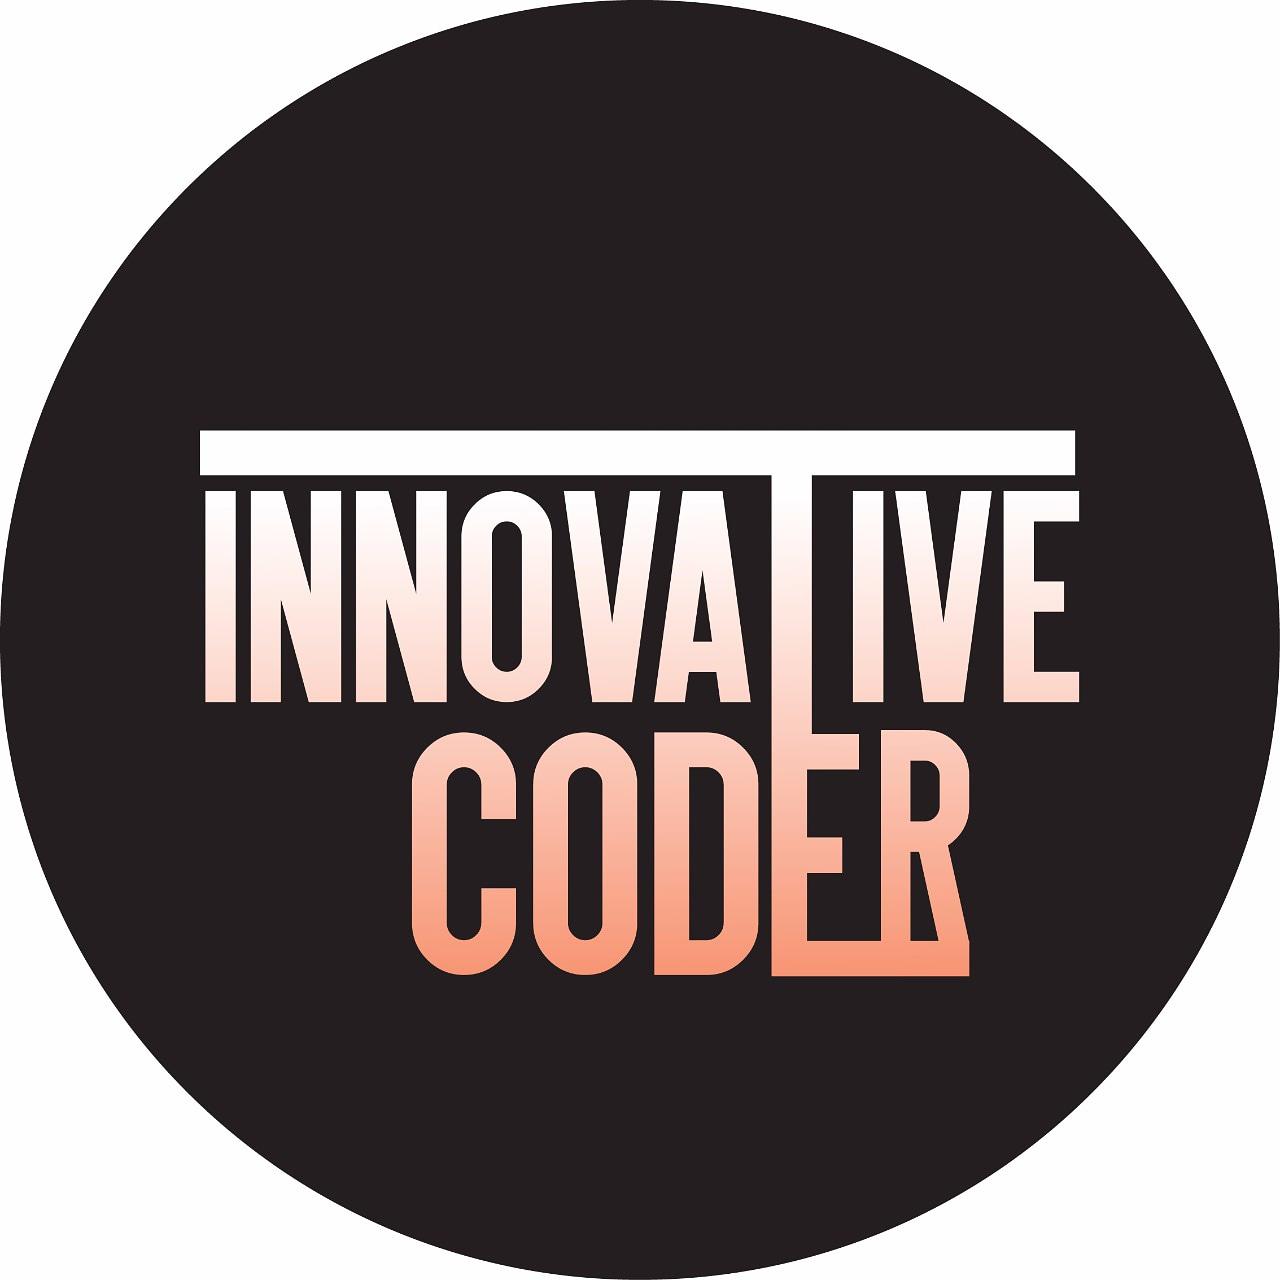 Innovative Coder